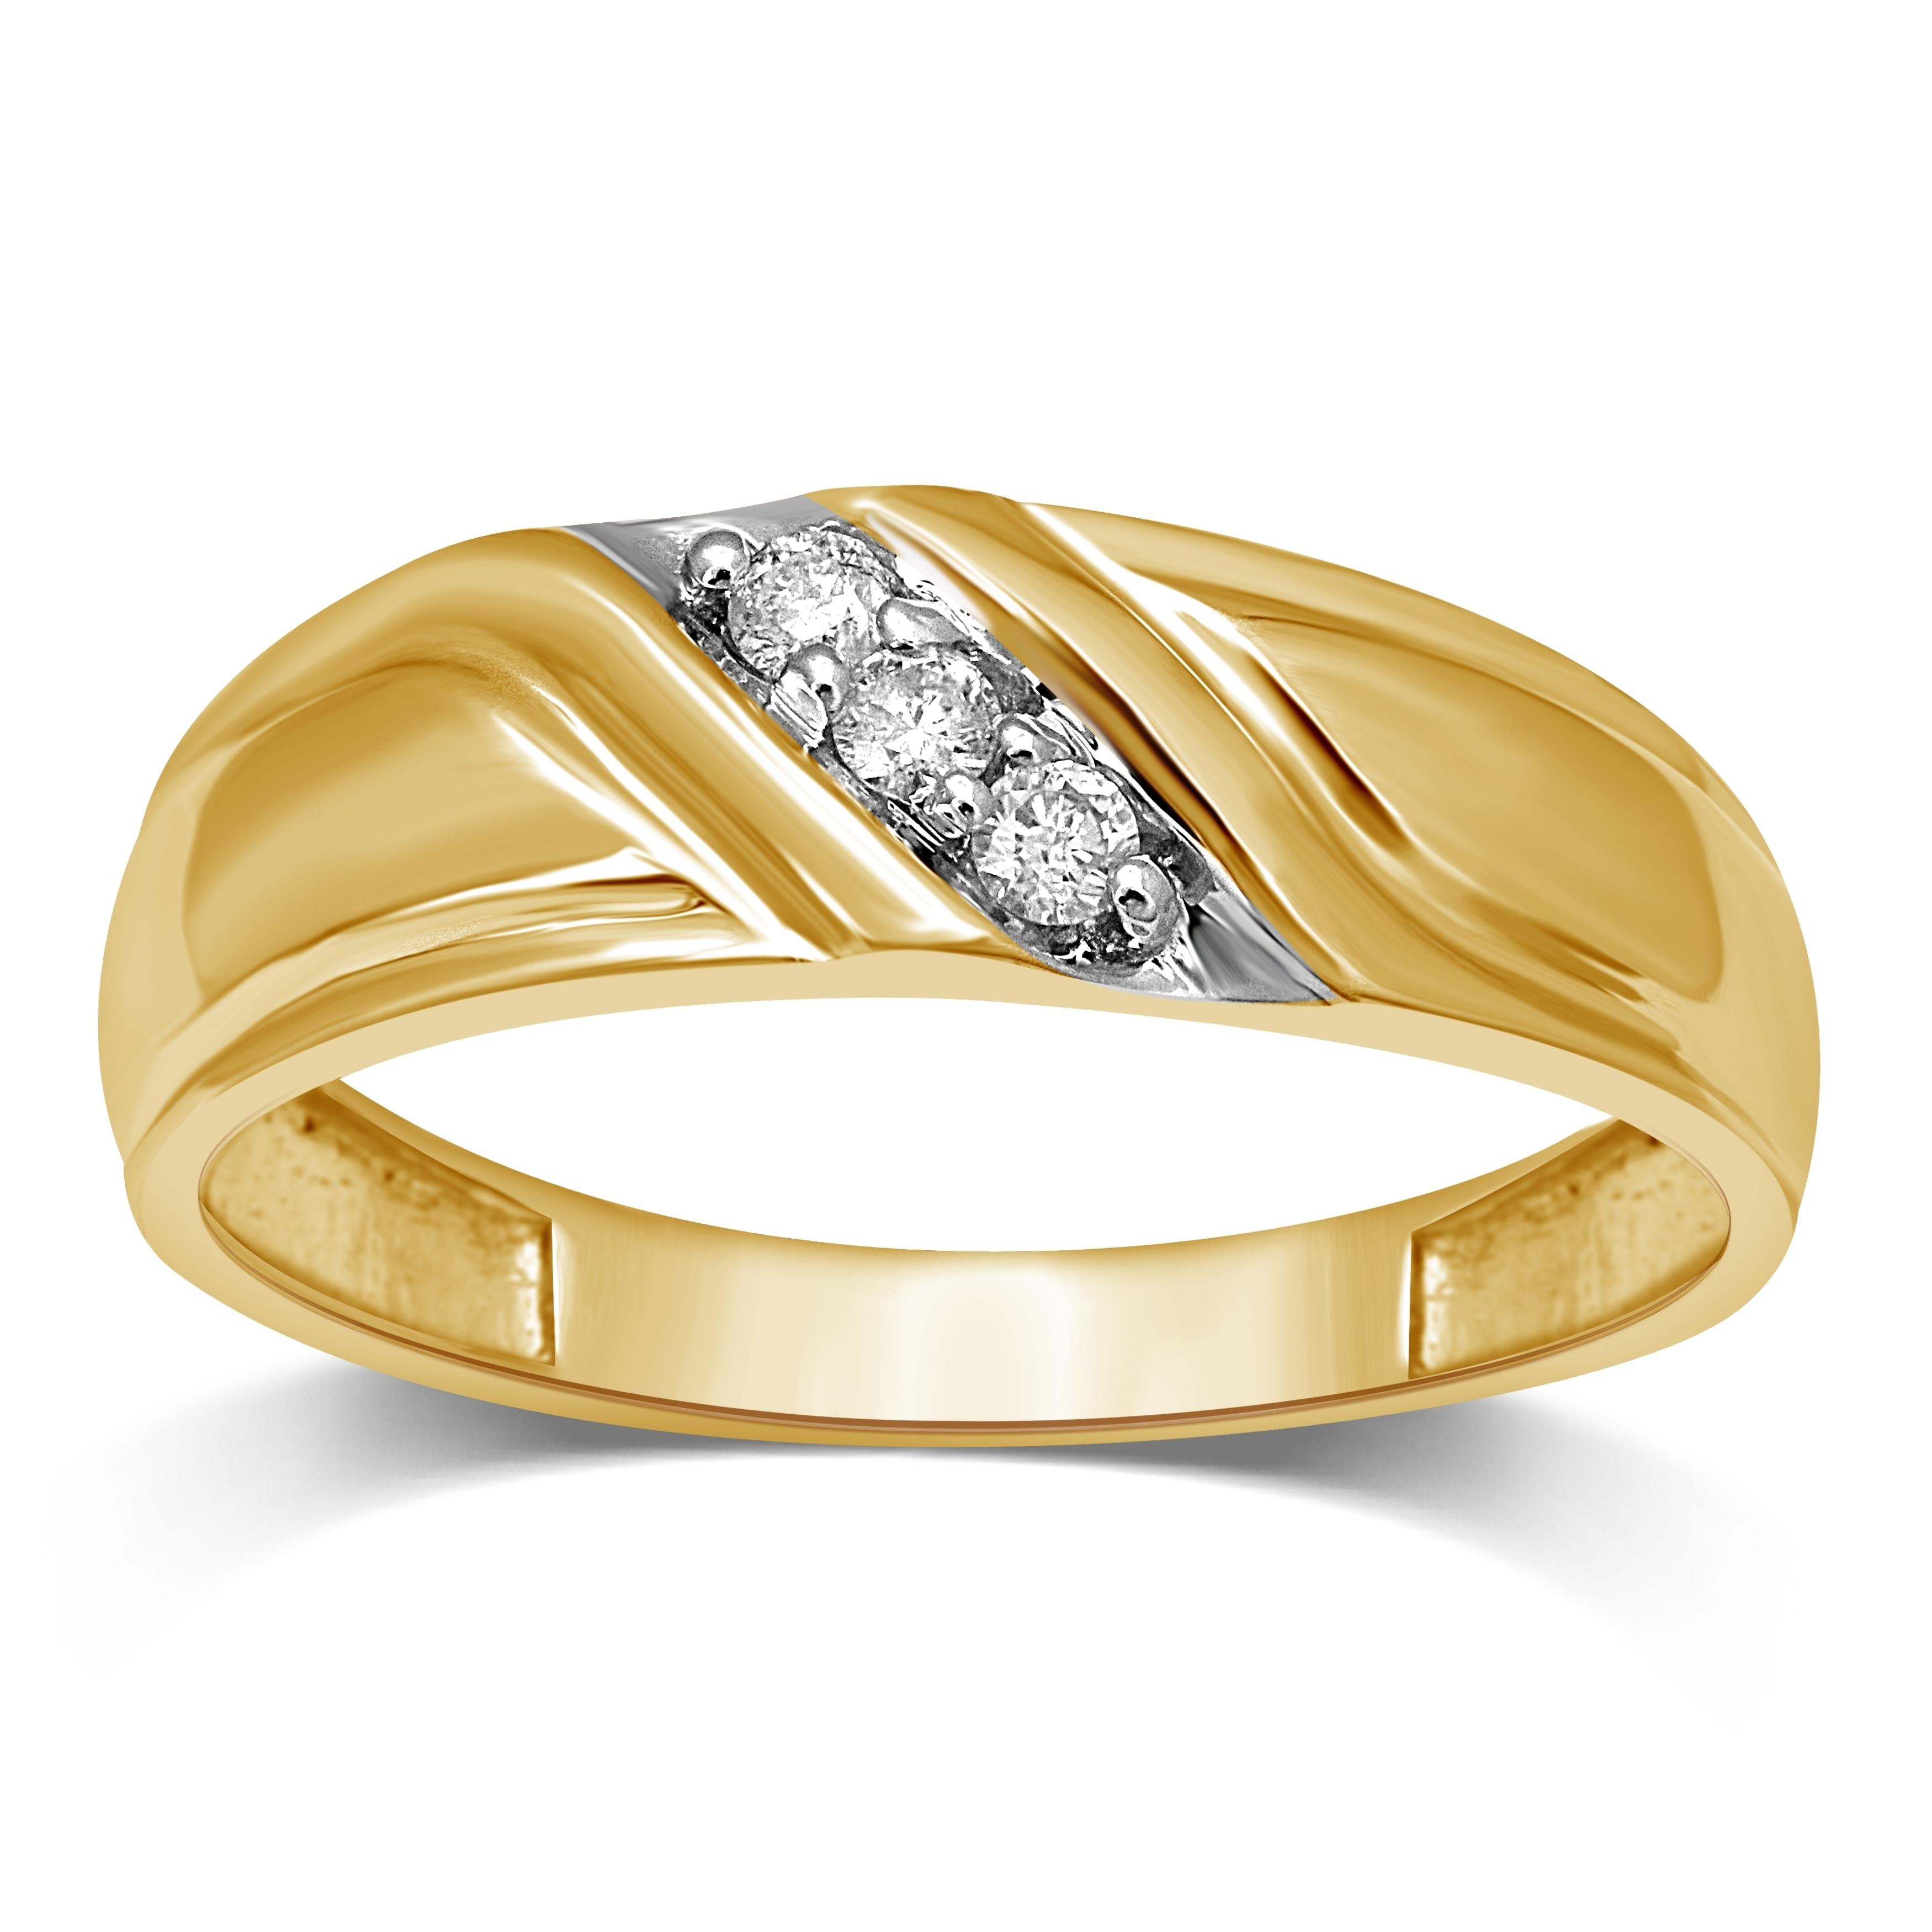 Shop Unending Love Men S 10k Gold 1 10 Ctw Diamond Wedding Band On Sale Overstock 10277528